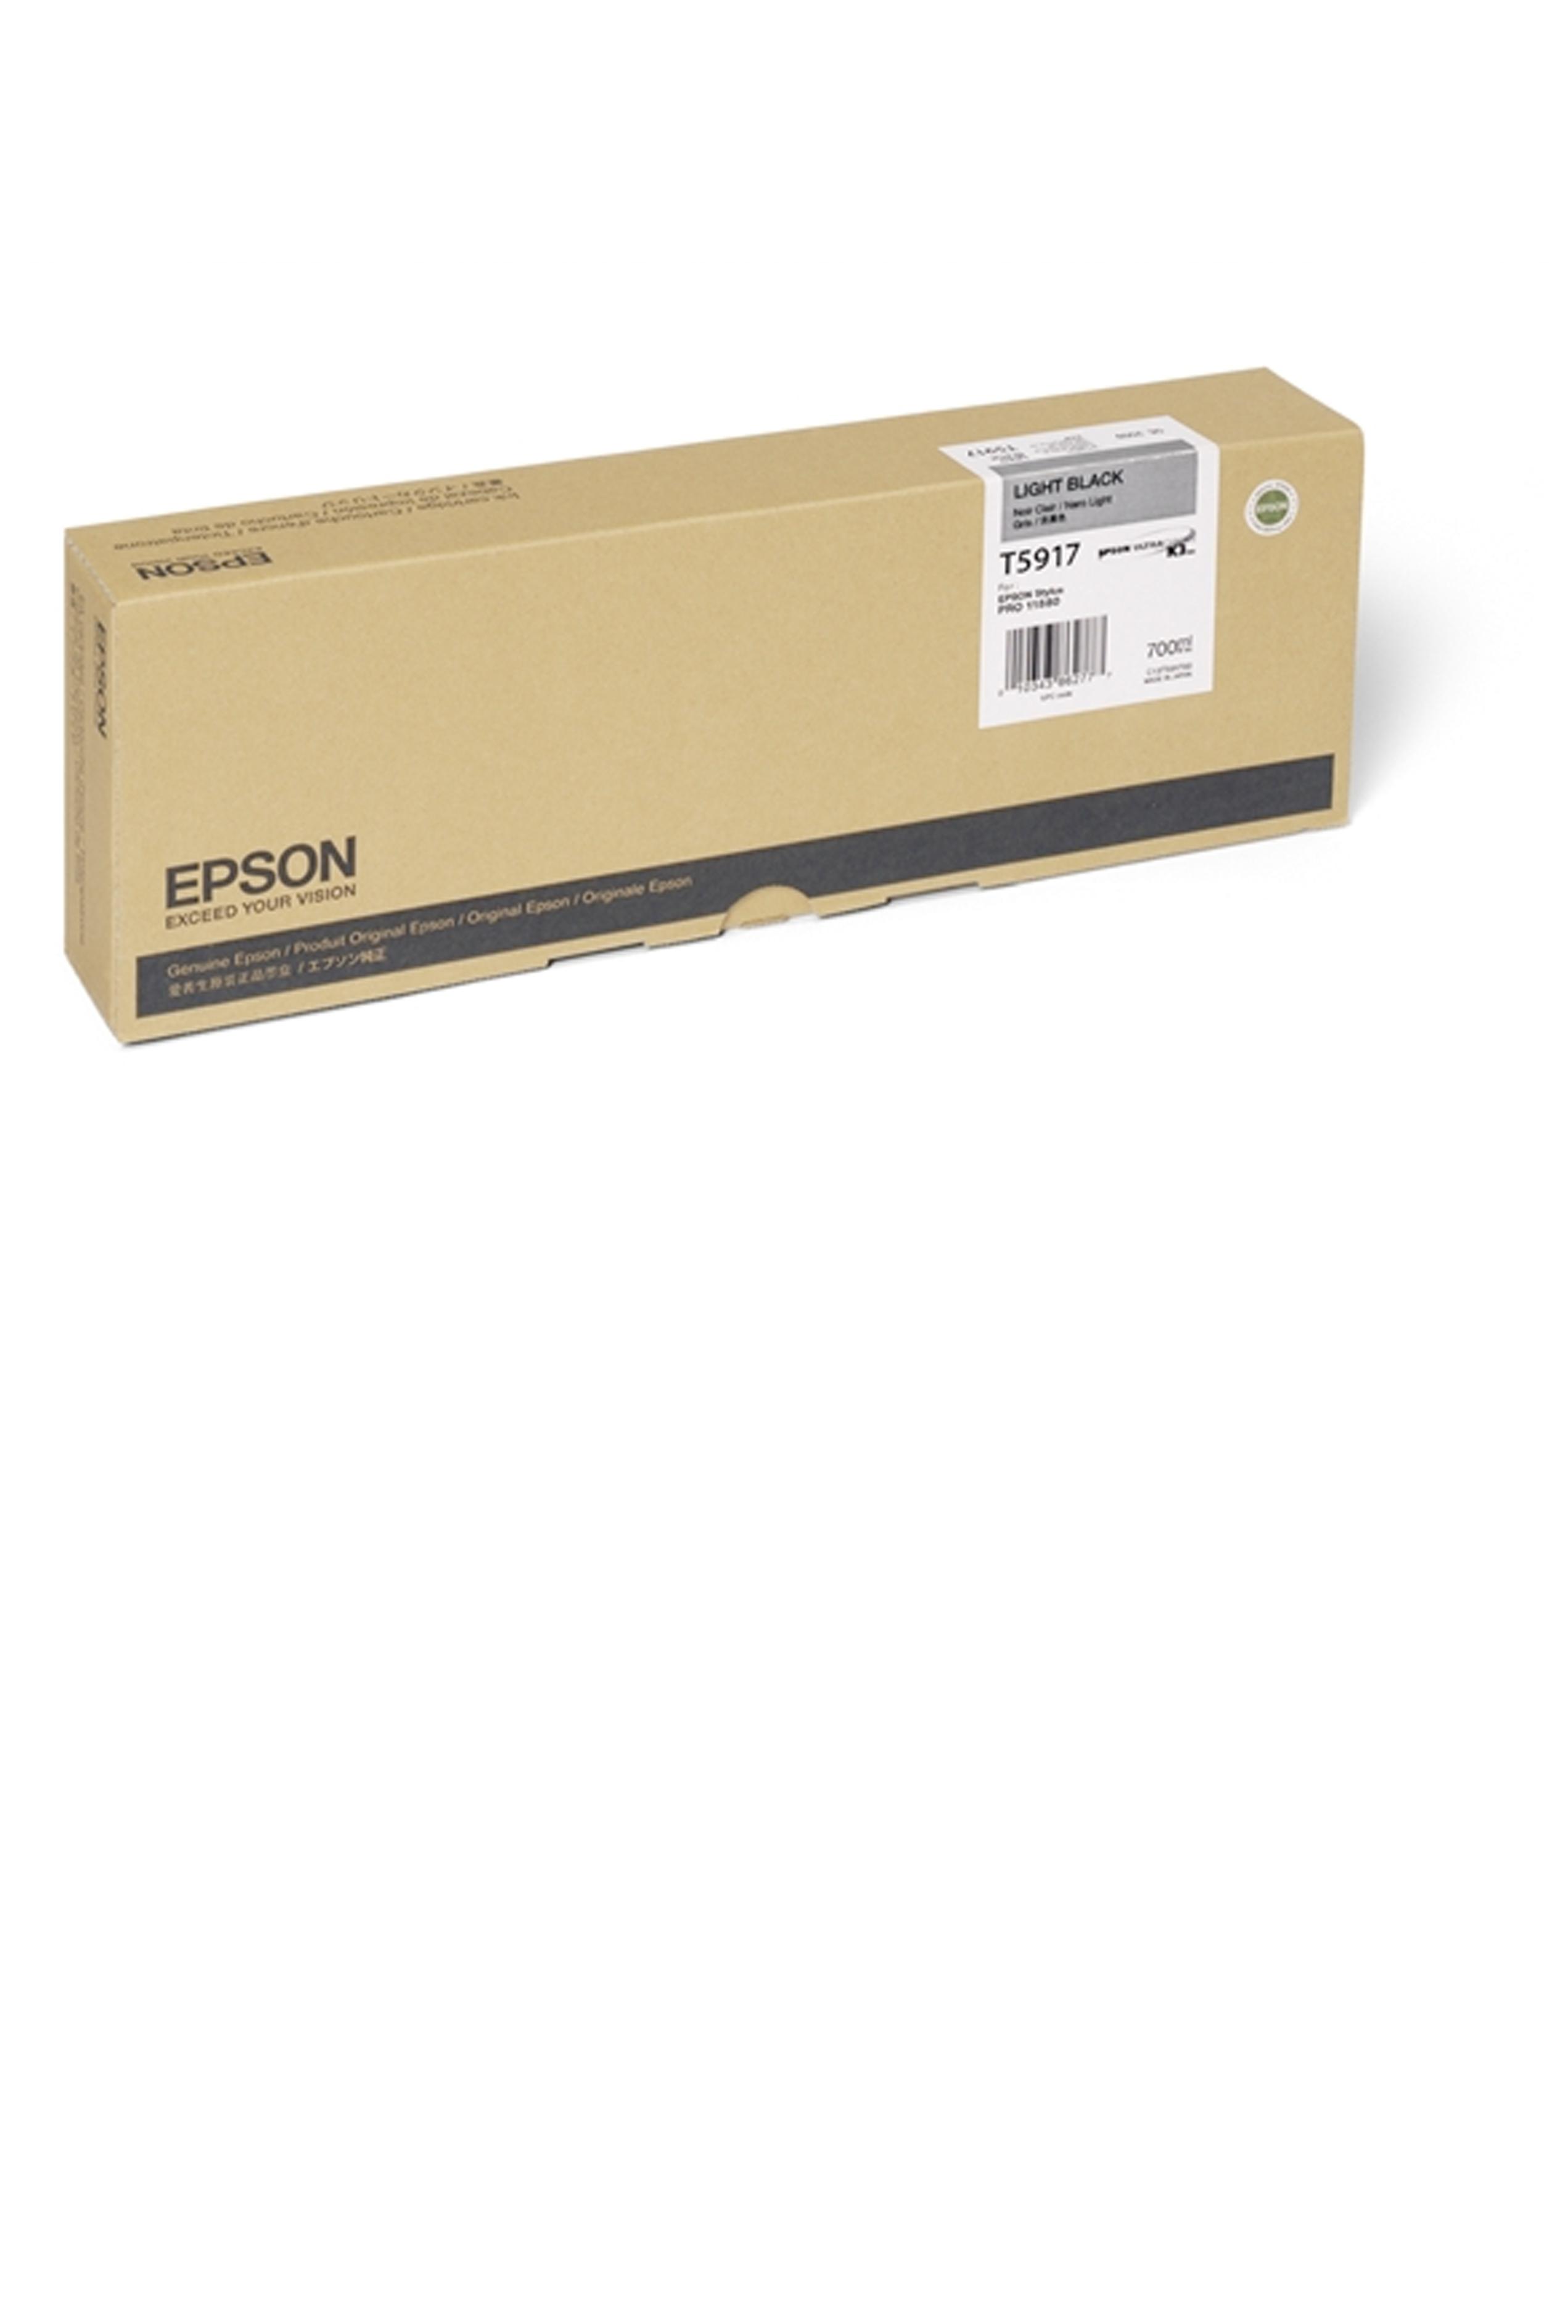 Epson EPSON HI LT BLACK INK (700 ML) (T591700)